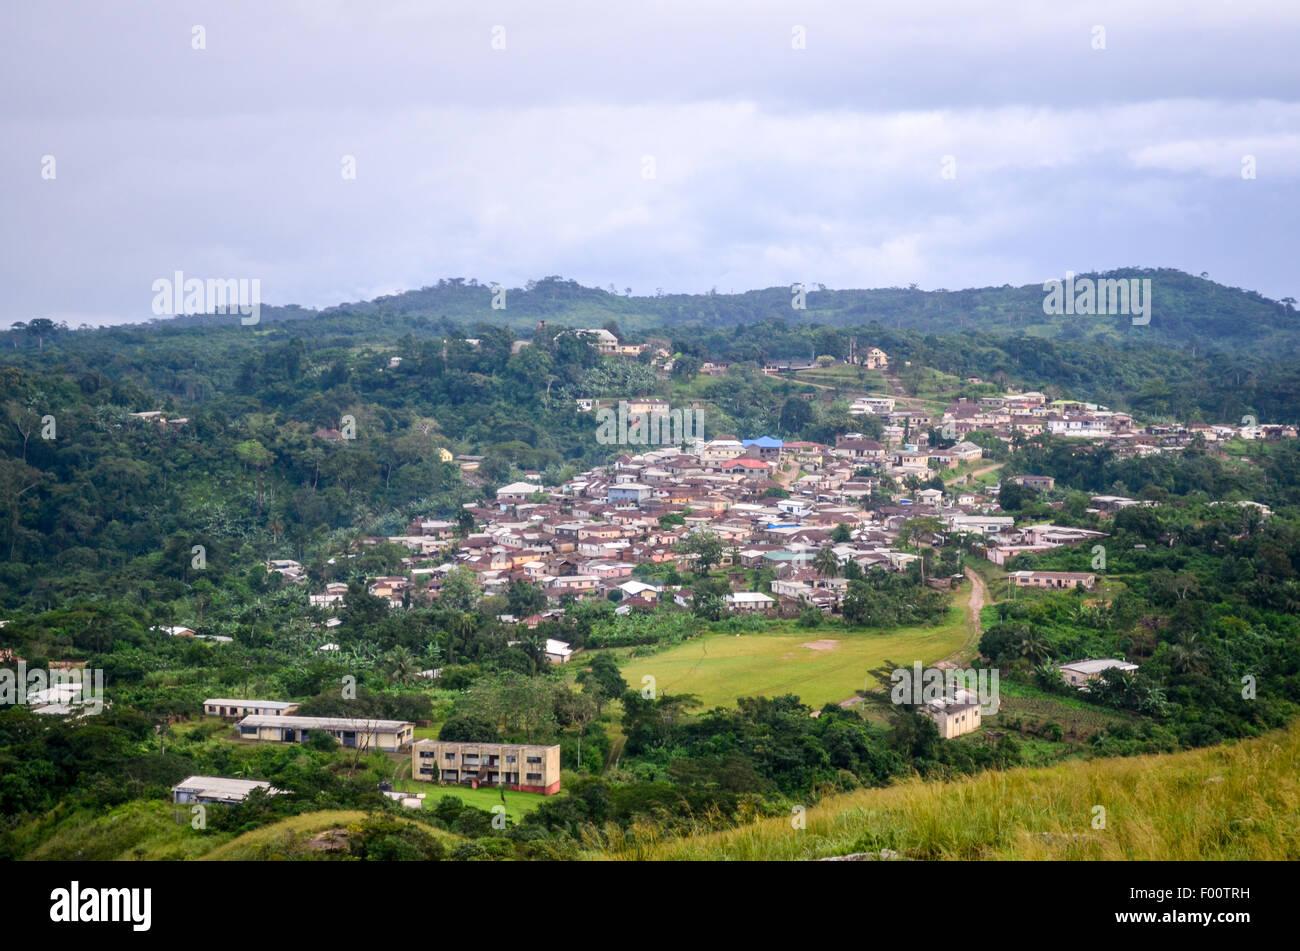 Touristic village of Amedzofe, Ghana - Stock Image